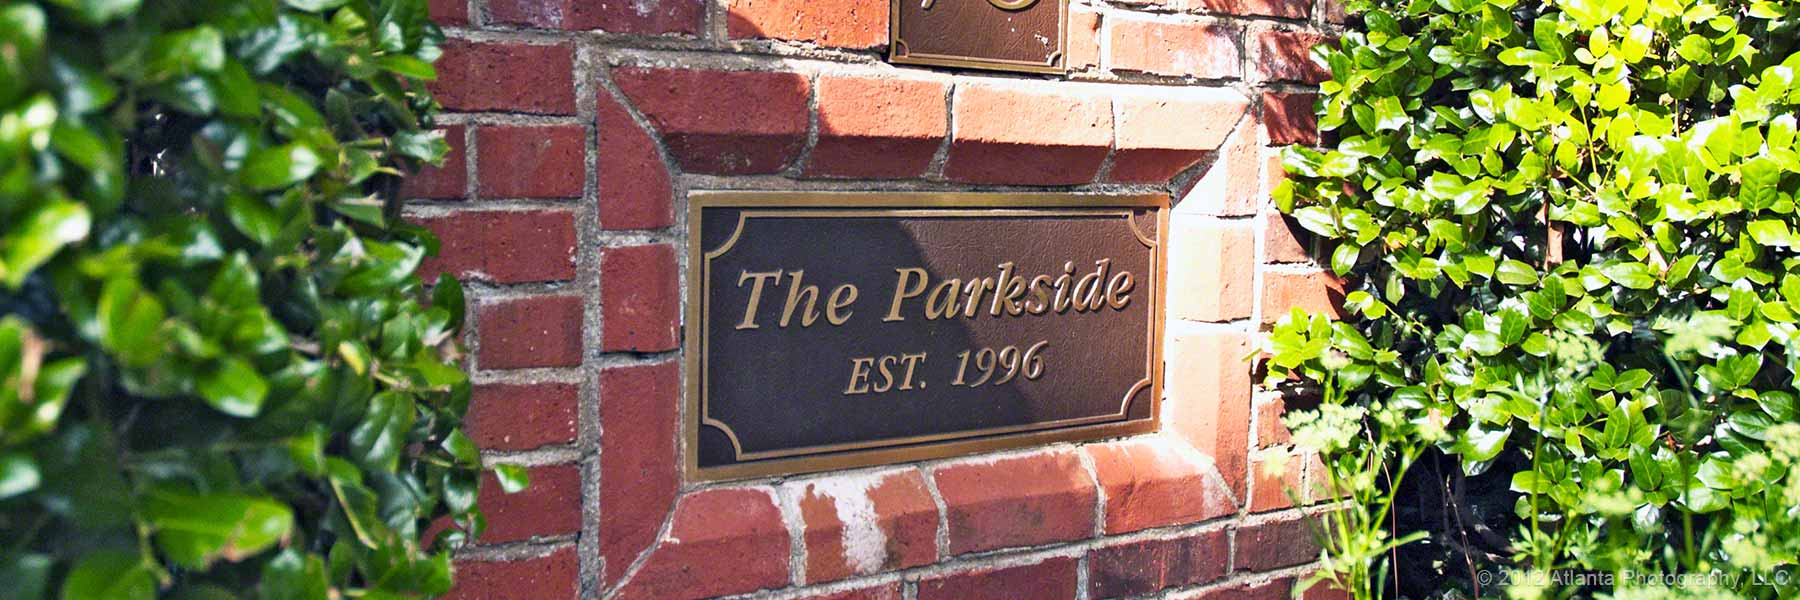 The Parkside